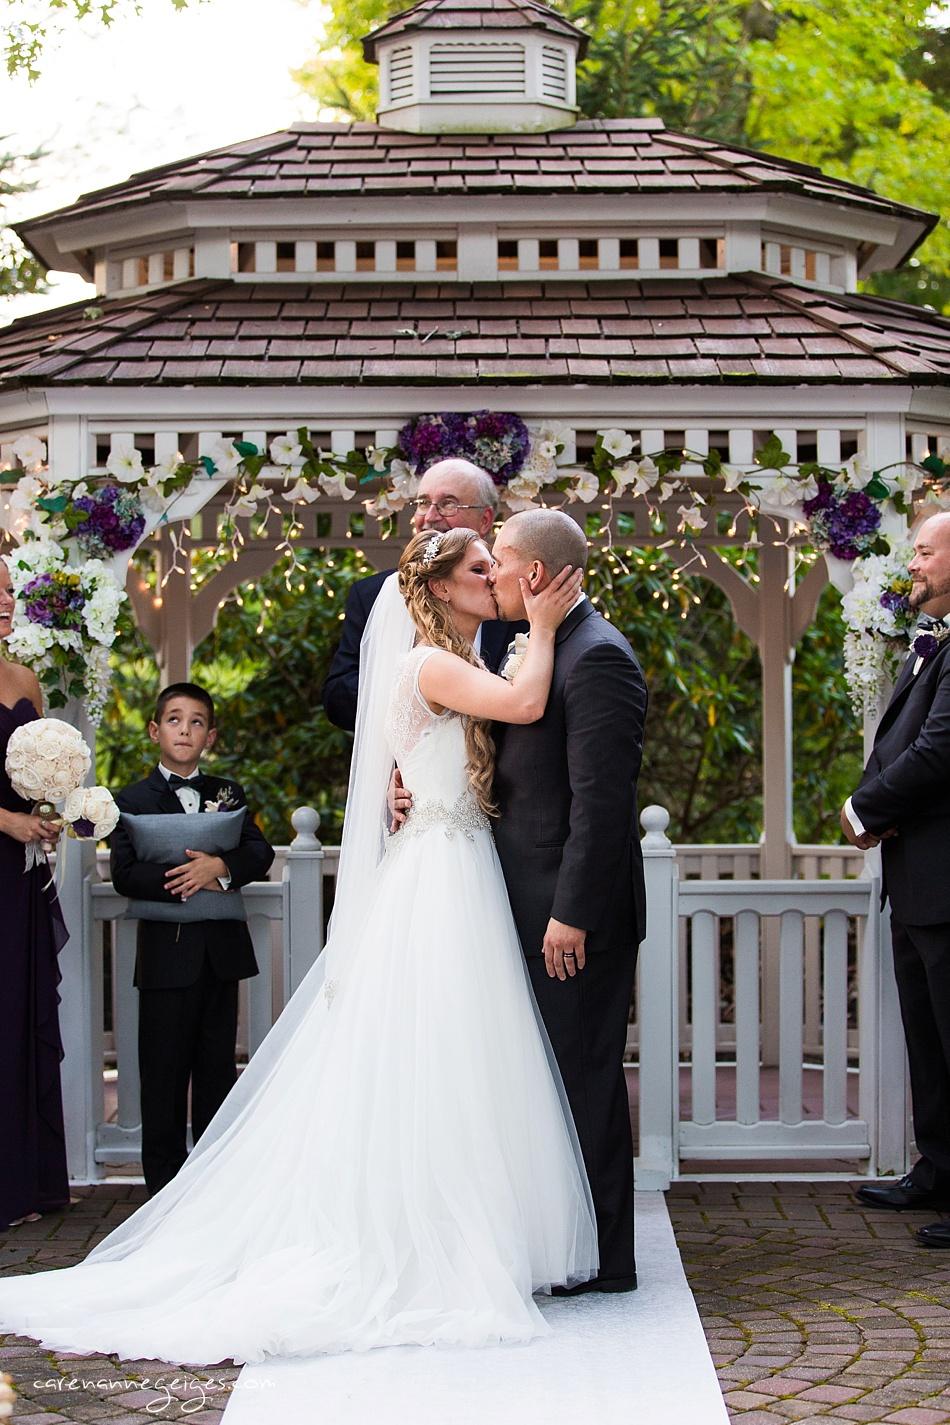 lisagreg-married-311